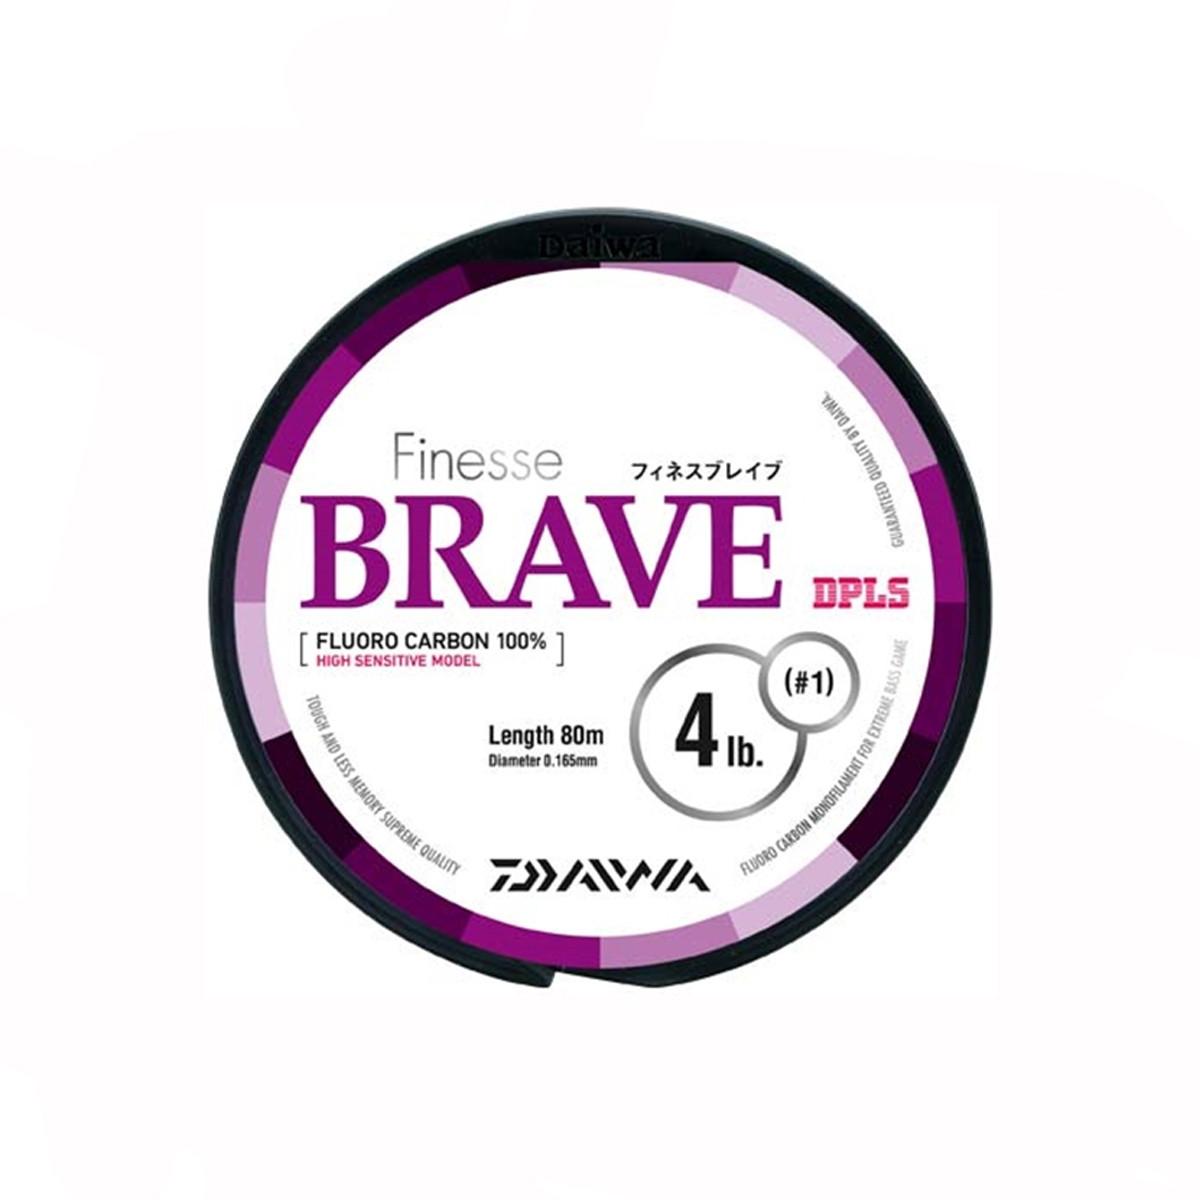 DAIWA FINESSE BRAVE 80M